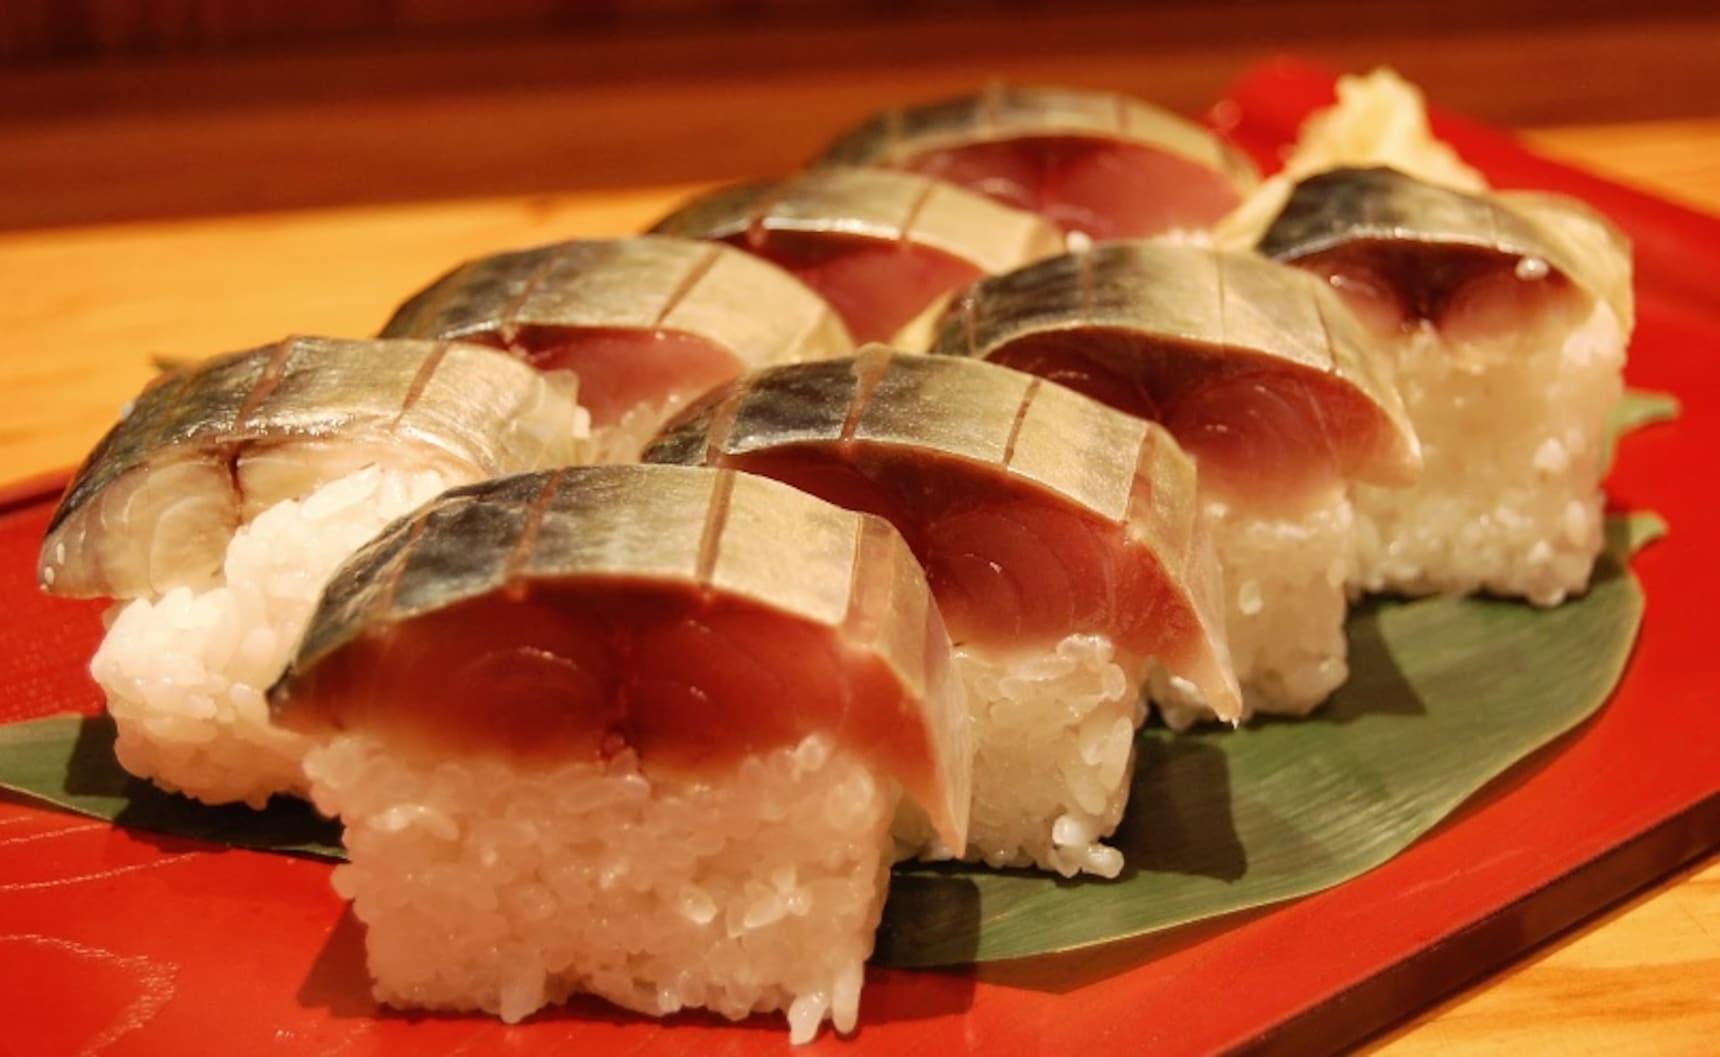 Kyoto's Top 3 'Kyozushi' Restaurants